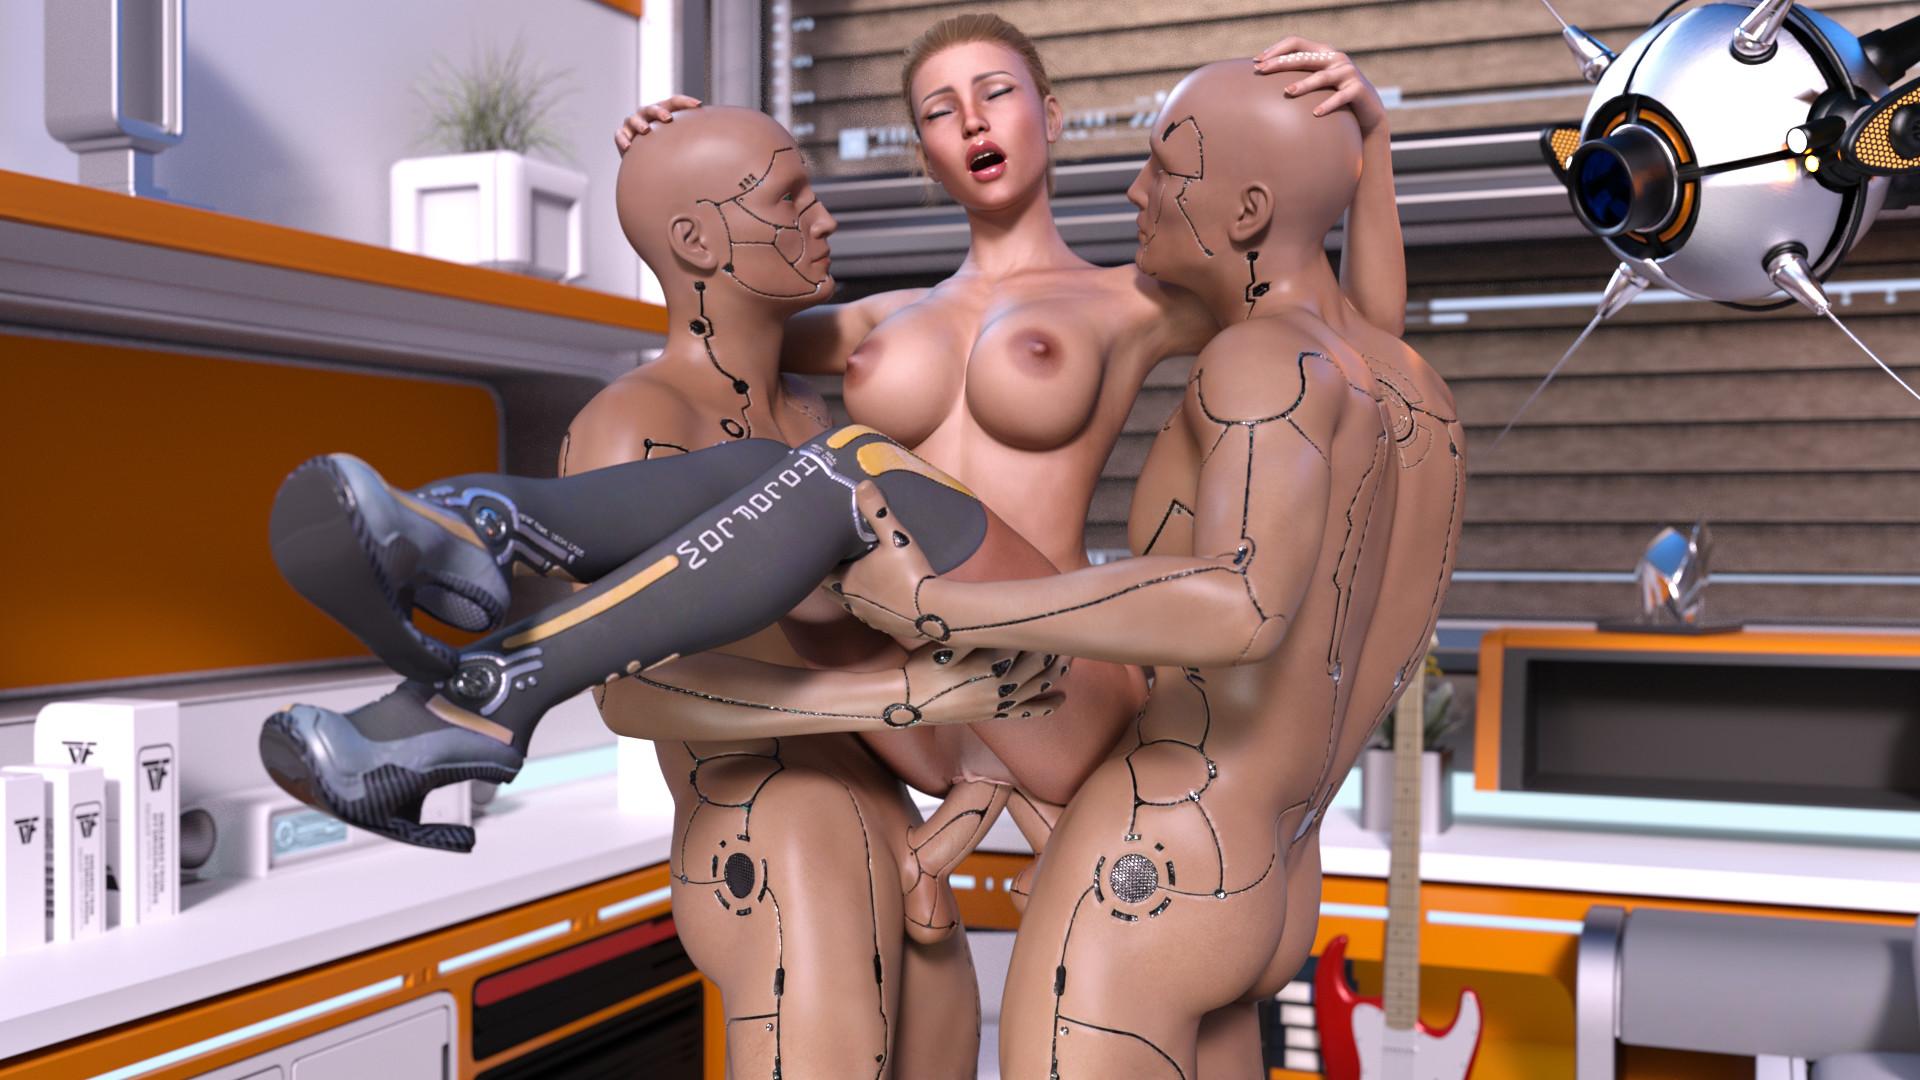 telku-trahaet-robot